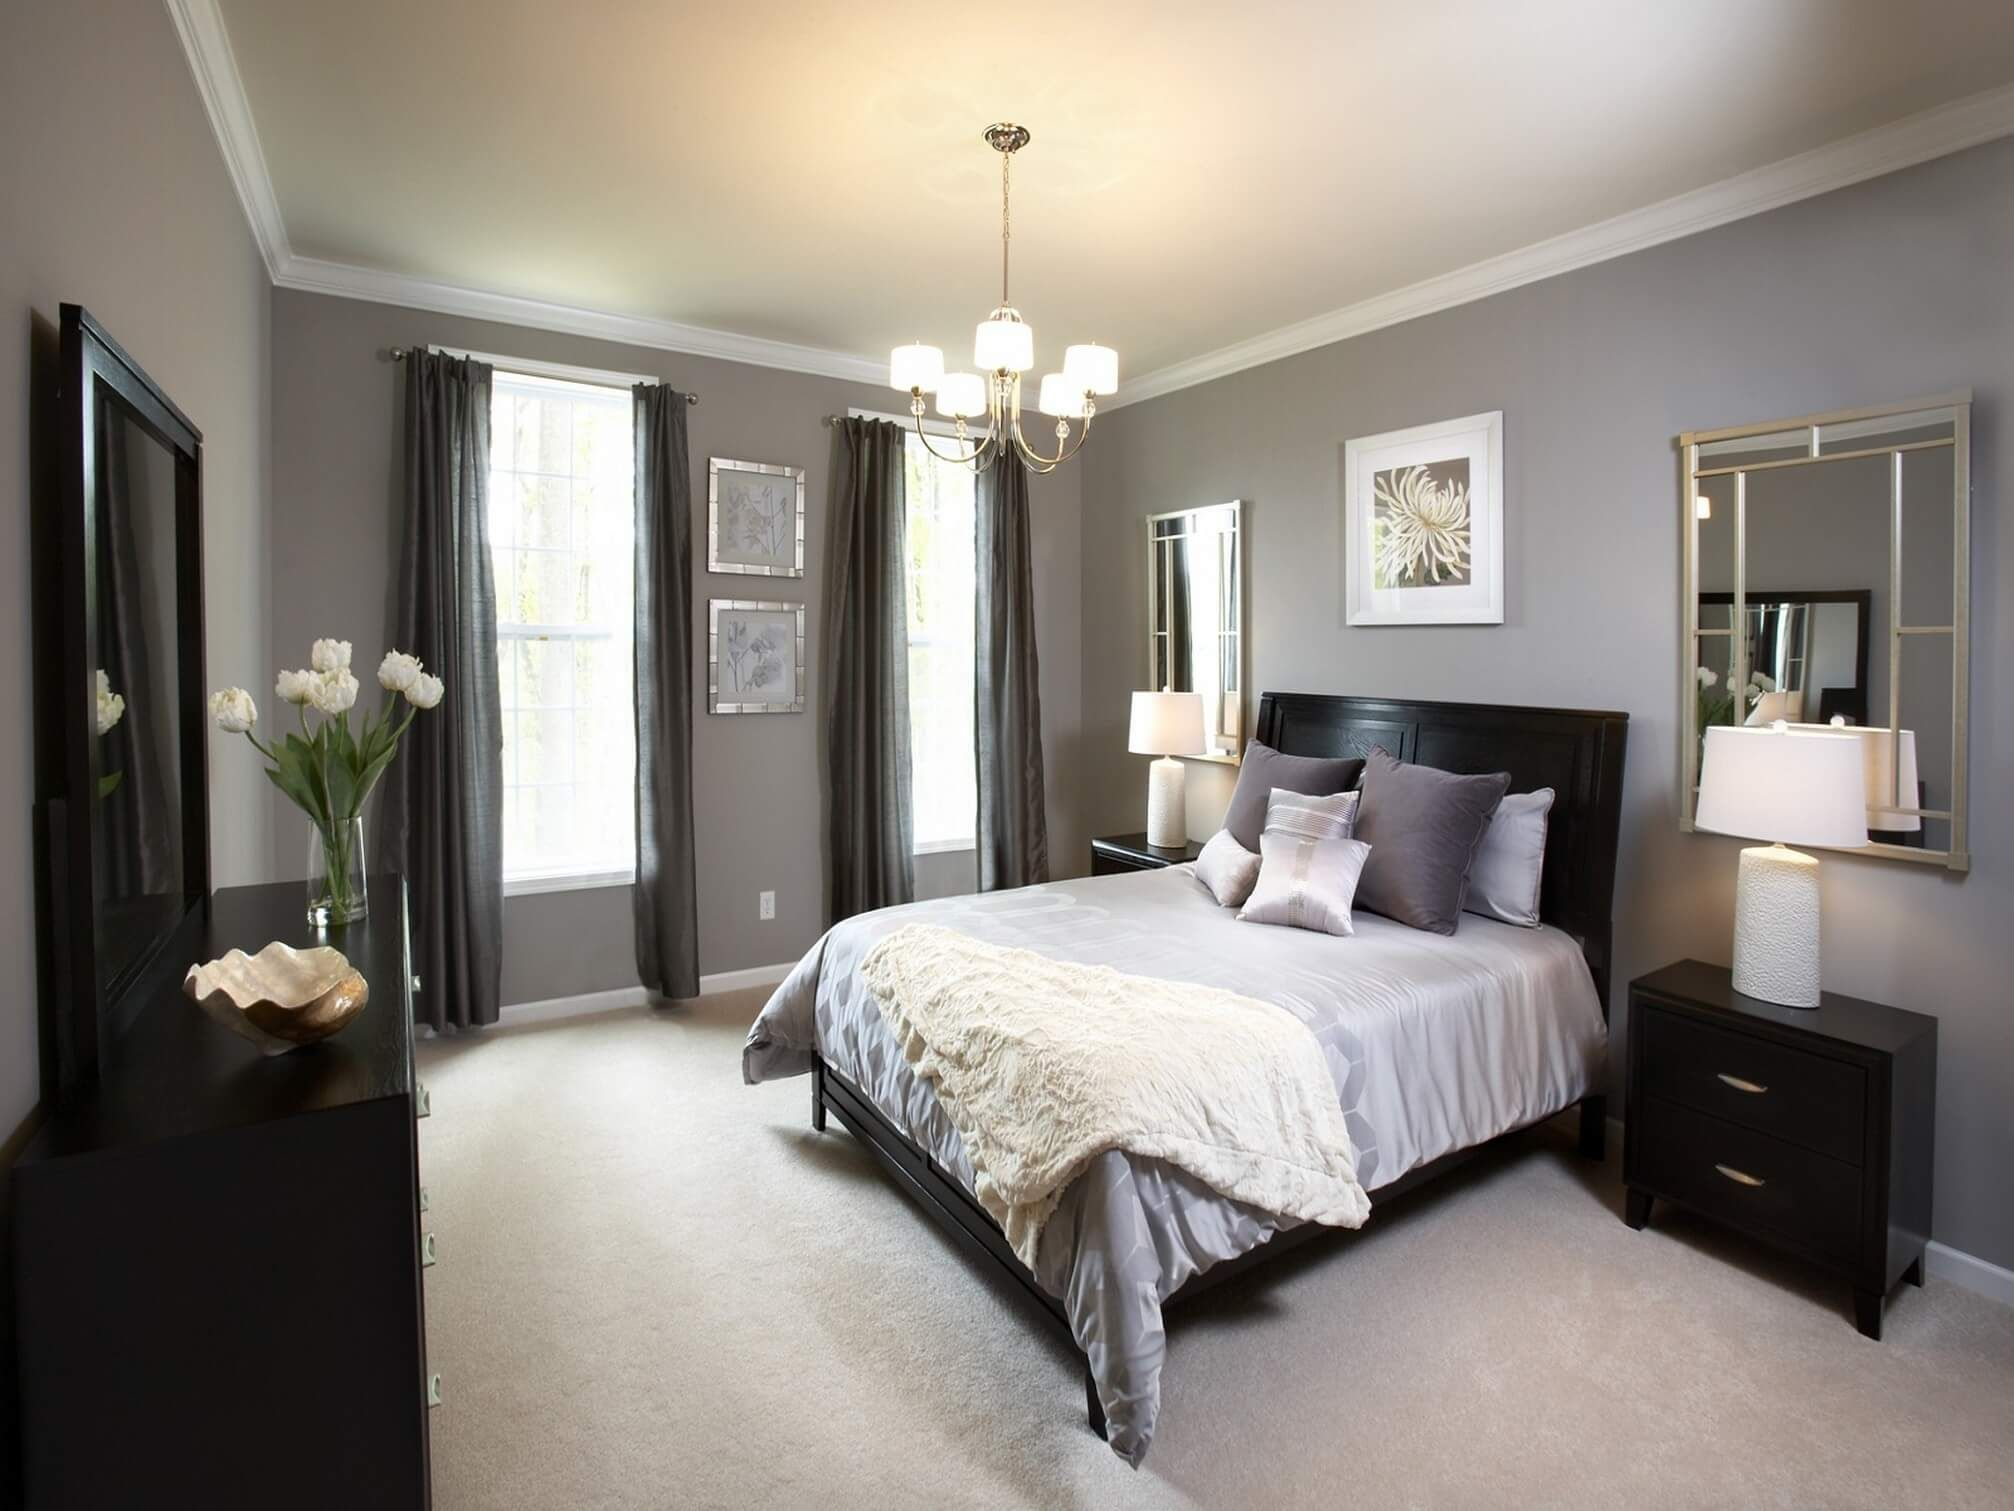 Design Bedroom Endearing 23 Cozy Grey Bedroom Ideas That You Will Adore  Design Bedroom 2018